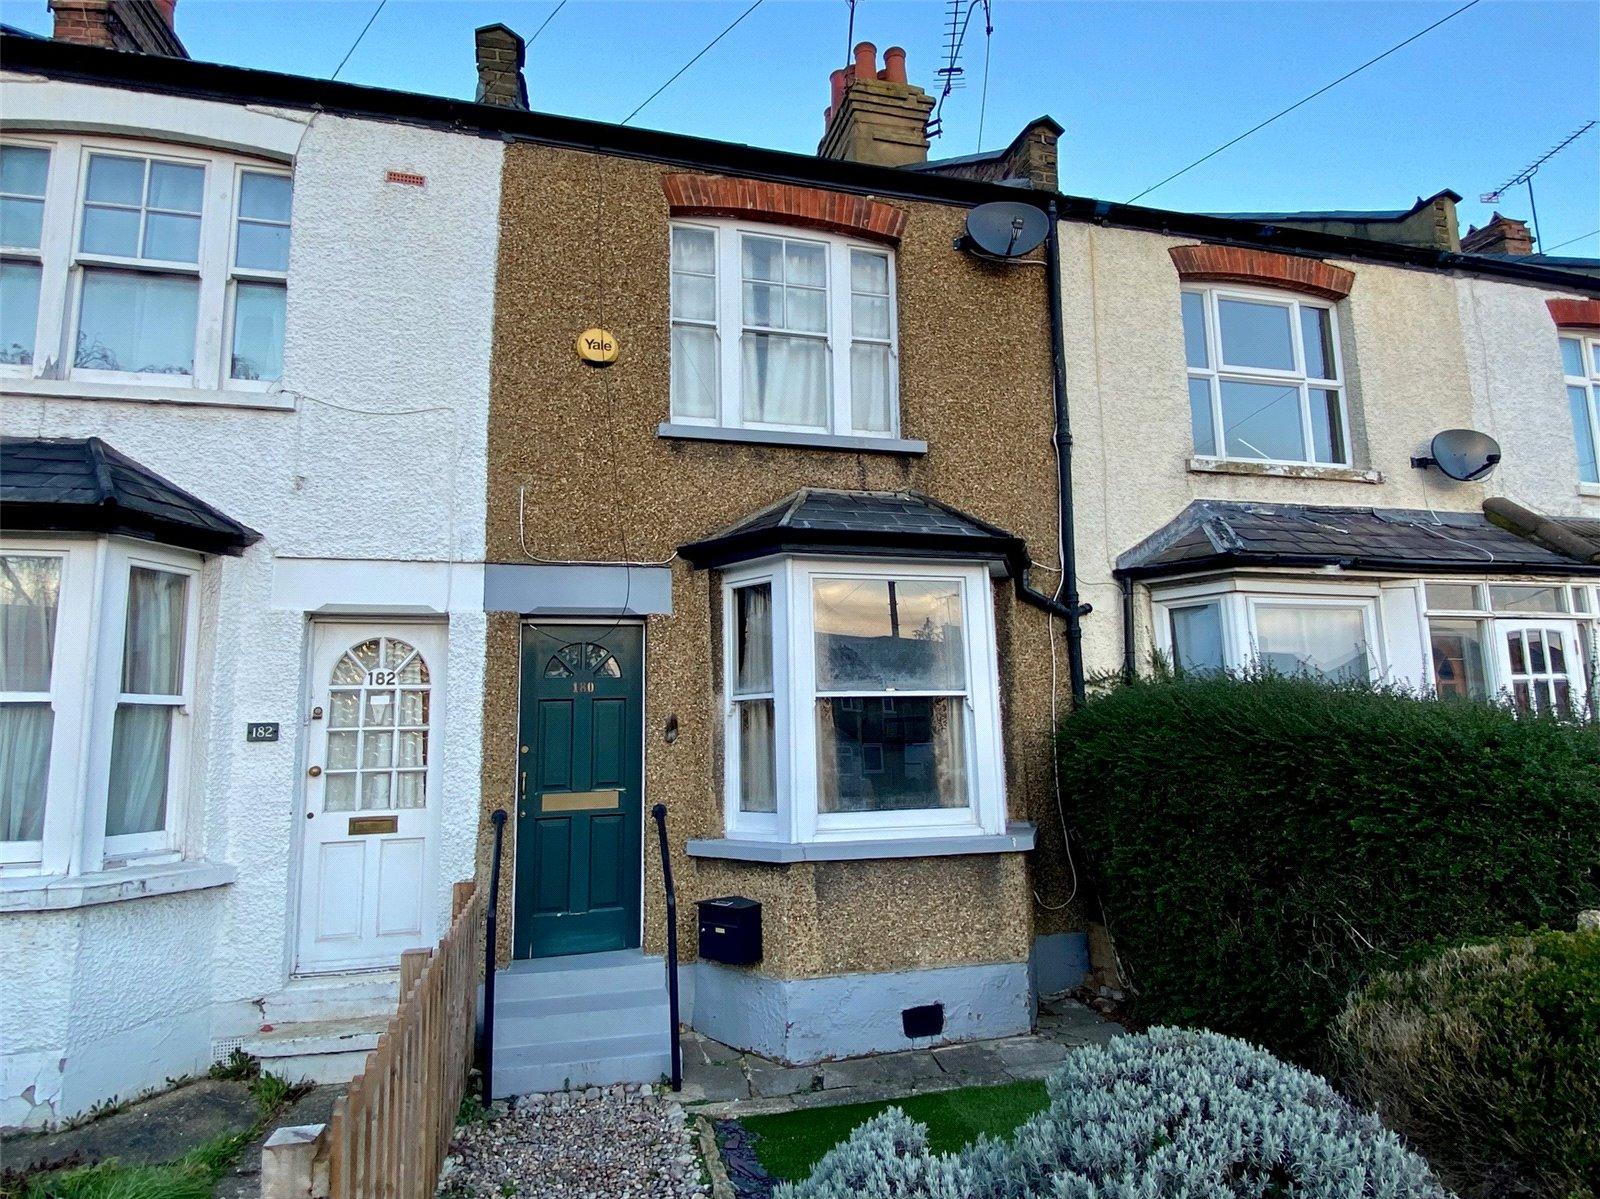 2 bed house to rent in Barnet, EN5 2LT, EN5